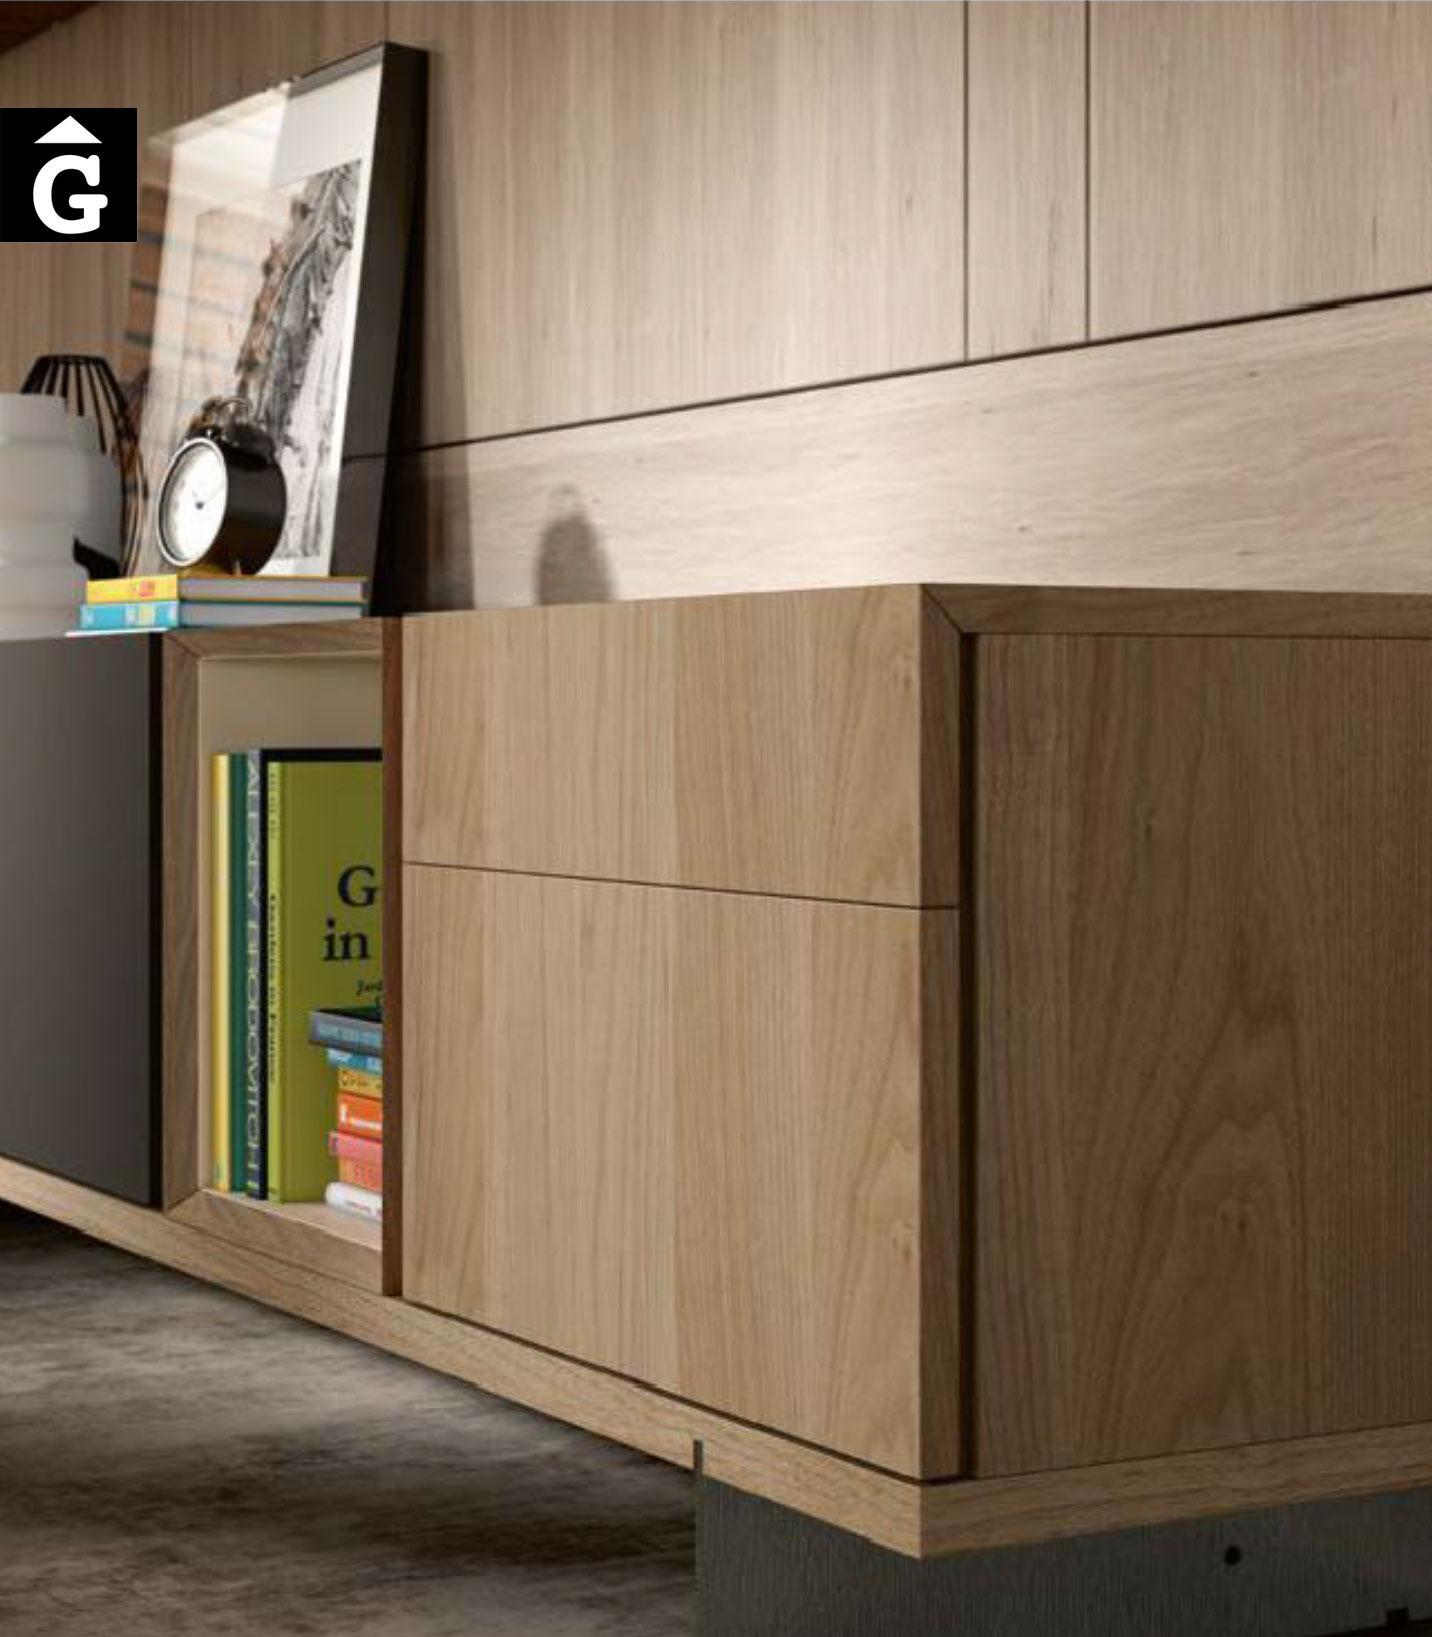 MOBLE-49-V-CONNECTOR-EMEDE-mobles-by-Mobles-GIFREU-Girona-ESPAI-EMEDE-Epacio-emede-Muebles-MD-moble-menjador-Sala-estar-habitatge-qualitat-laca-xapa-natural